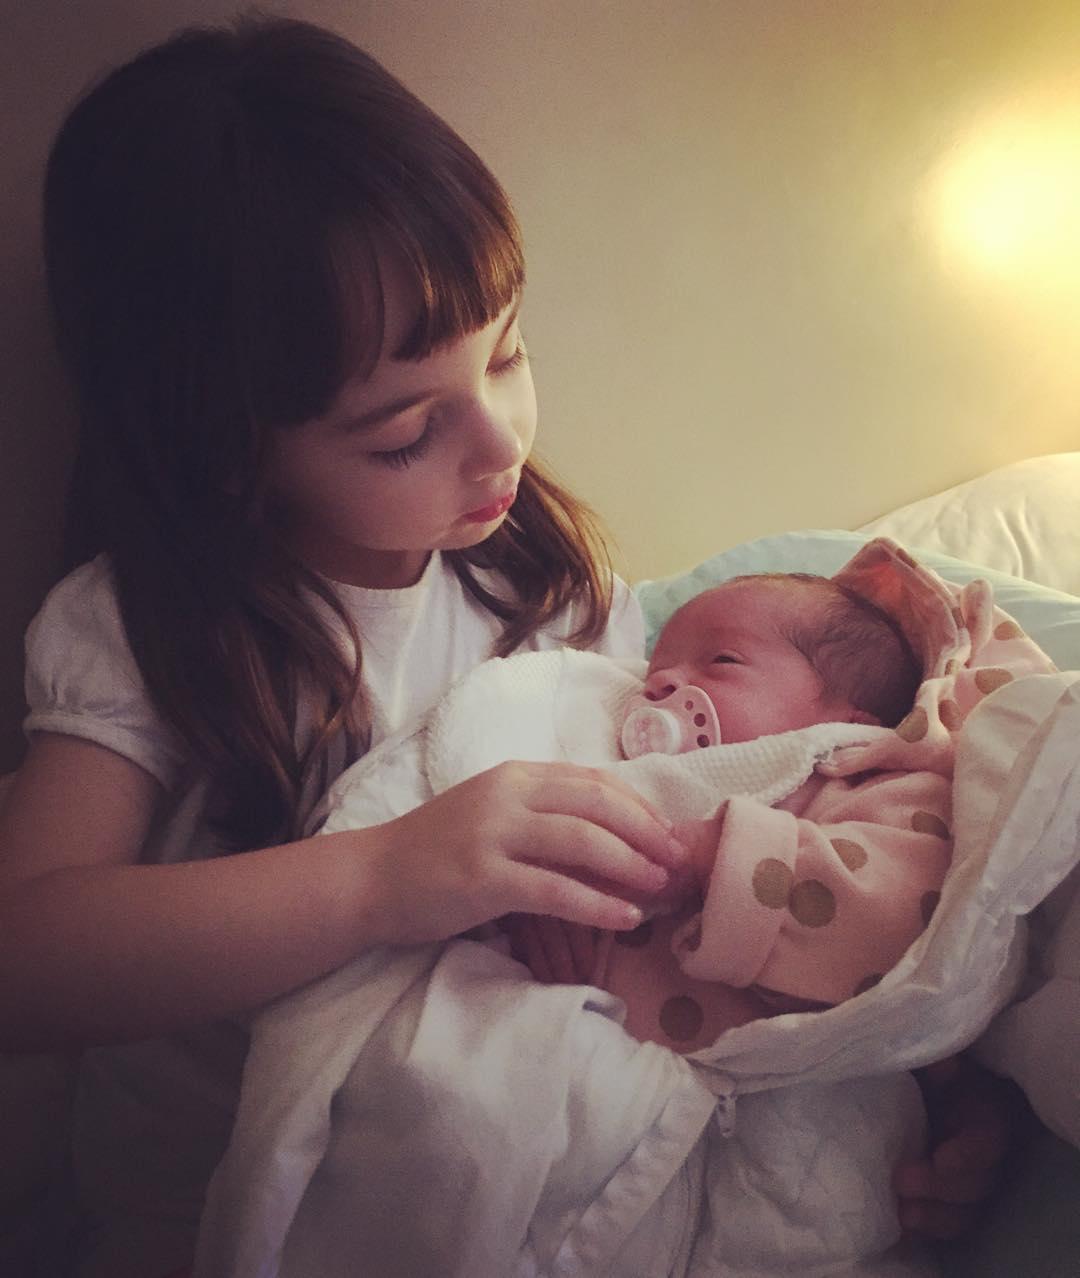 Isadora petite maman et calmeuse en chef Quand Freyja ahellip